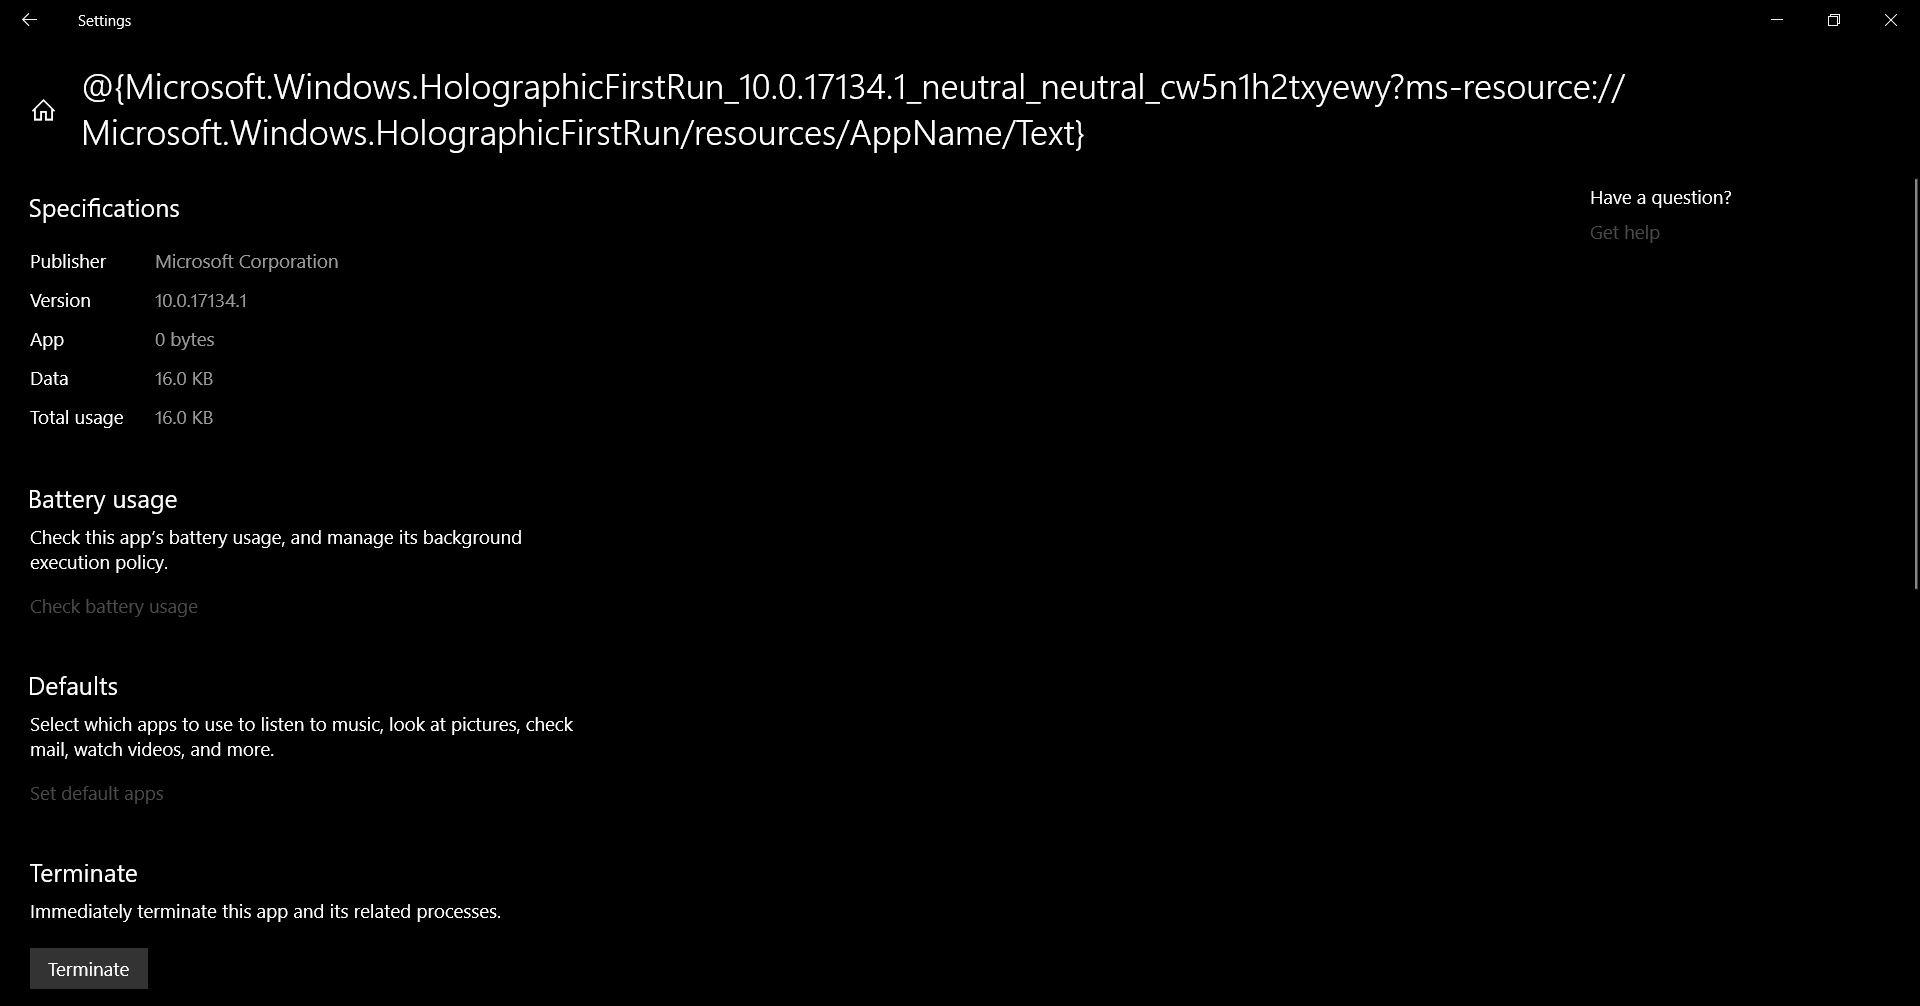 I have an unkonwn shortcut at my start menu 895caff3-22a4-48af-a37d-e34f2eddac4b?upload=true.jpg